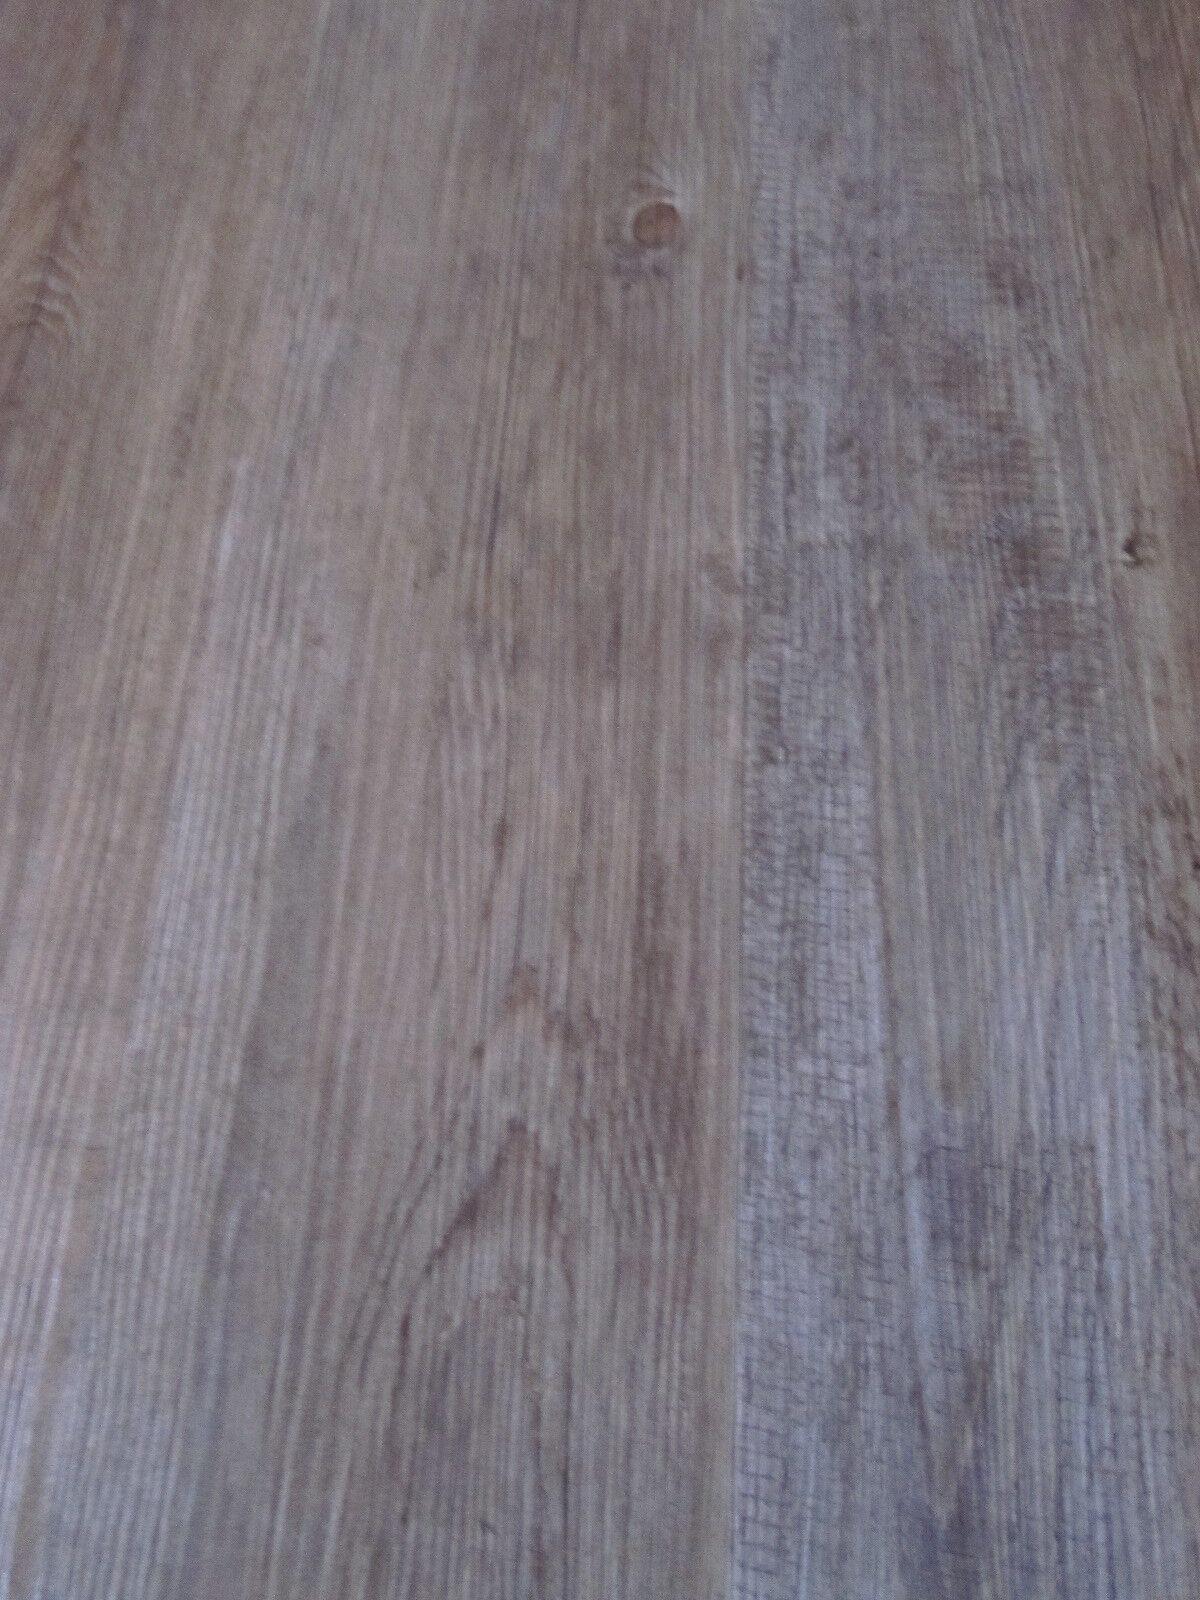 50 m vinylboden eiche vinyl pvc holzoptik parkett laminat restposten holz klick ebay. Black Bedroom Furniture Sets. Home Design Ideas